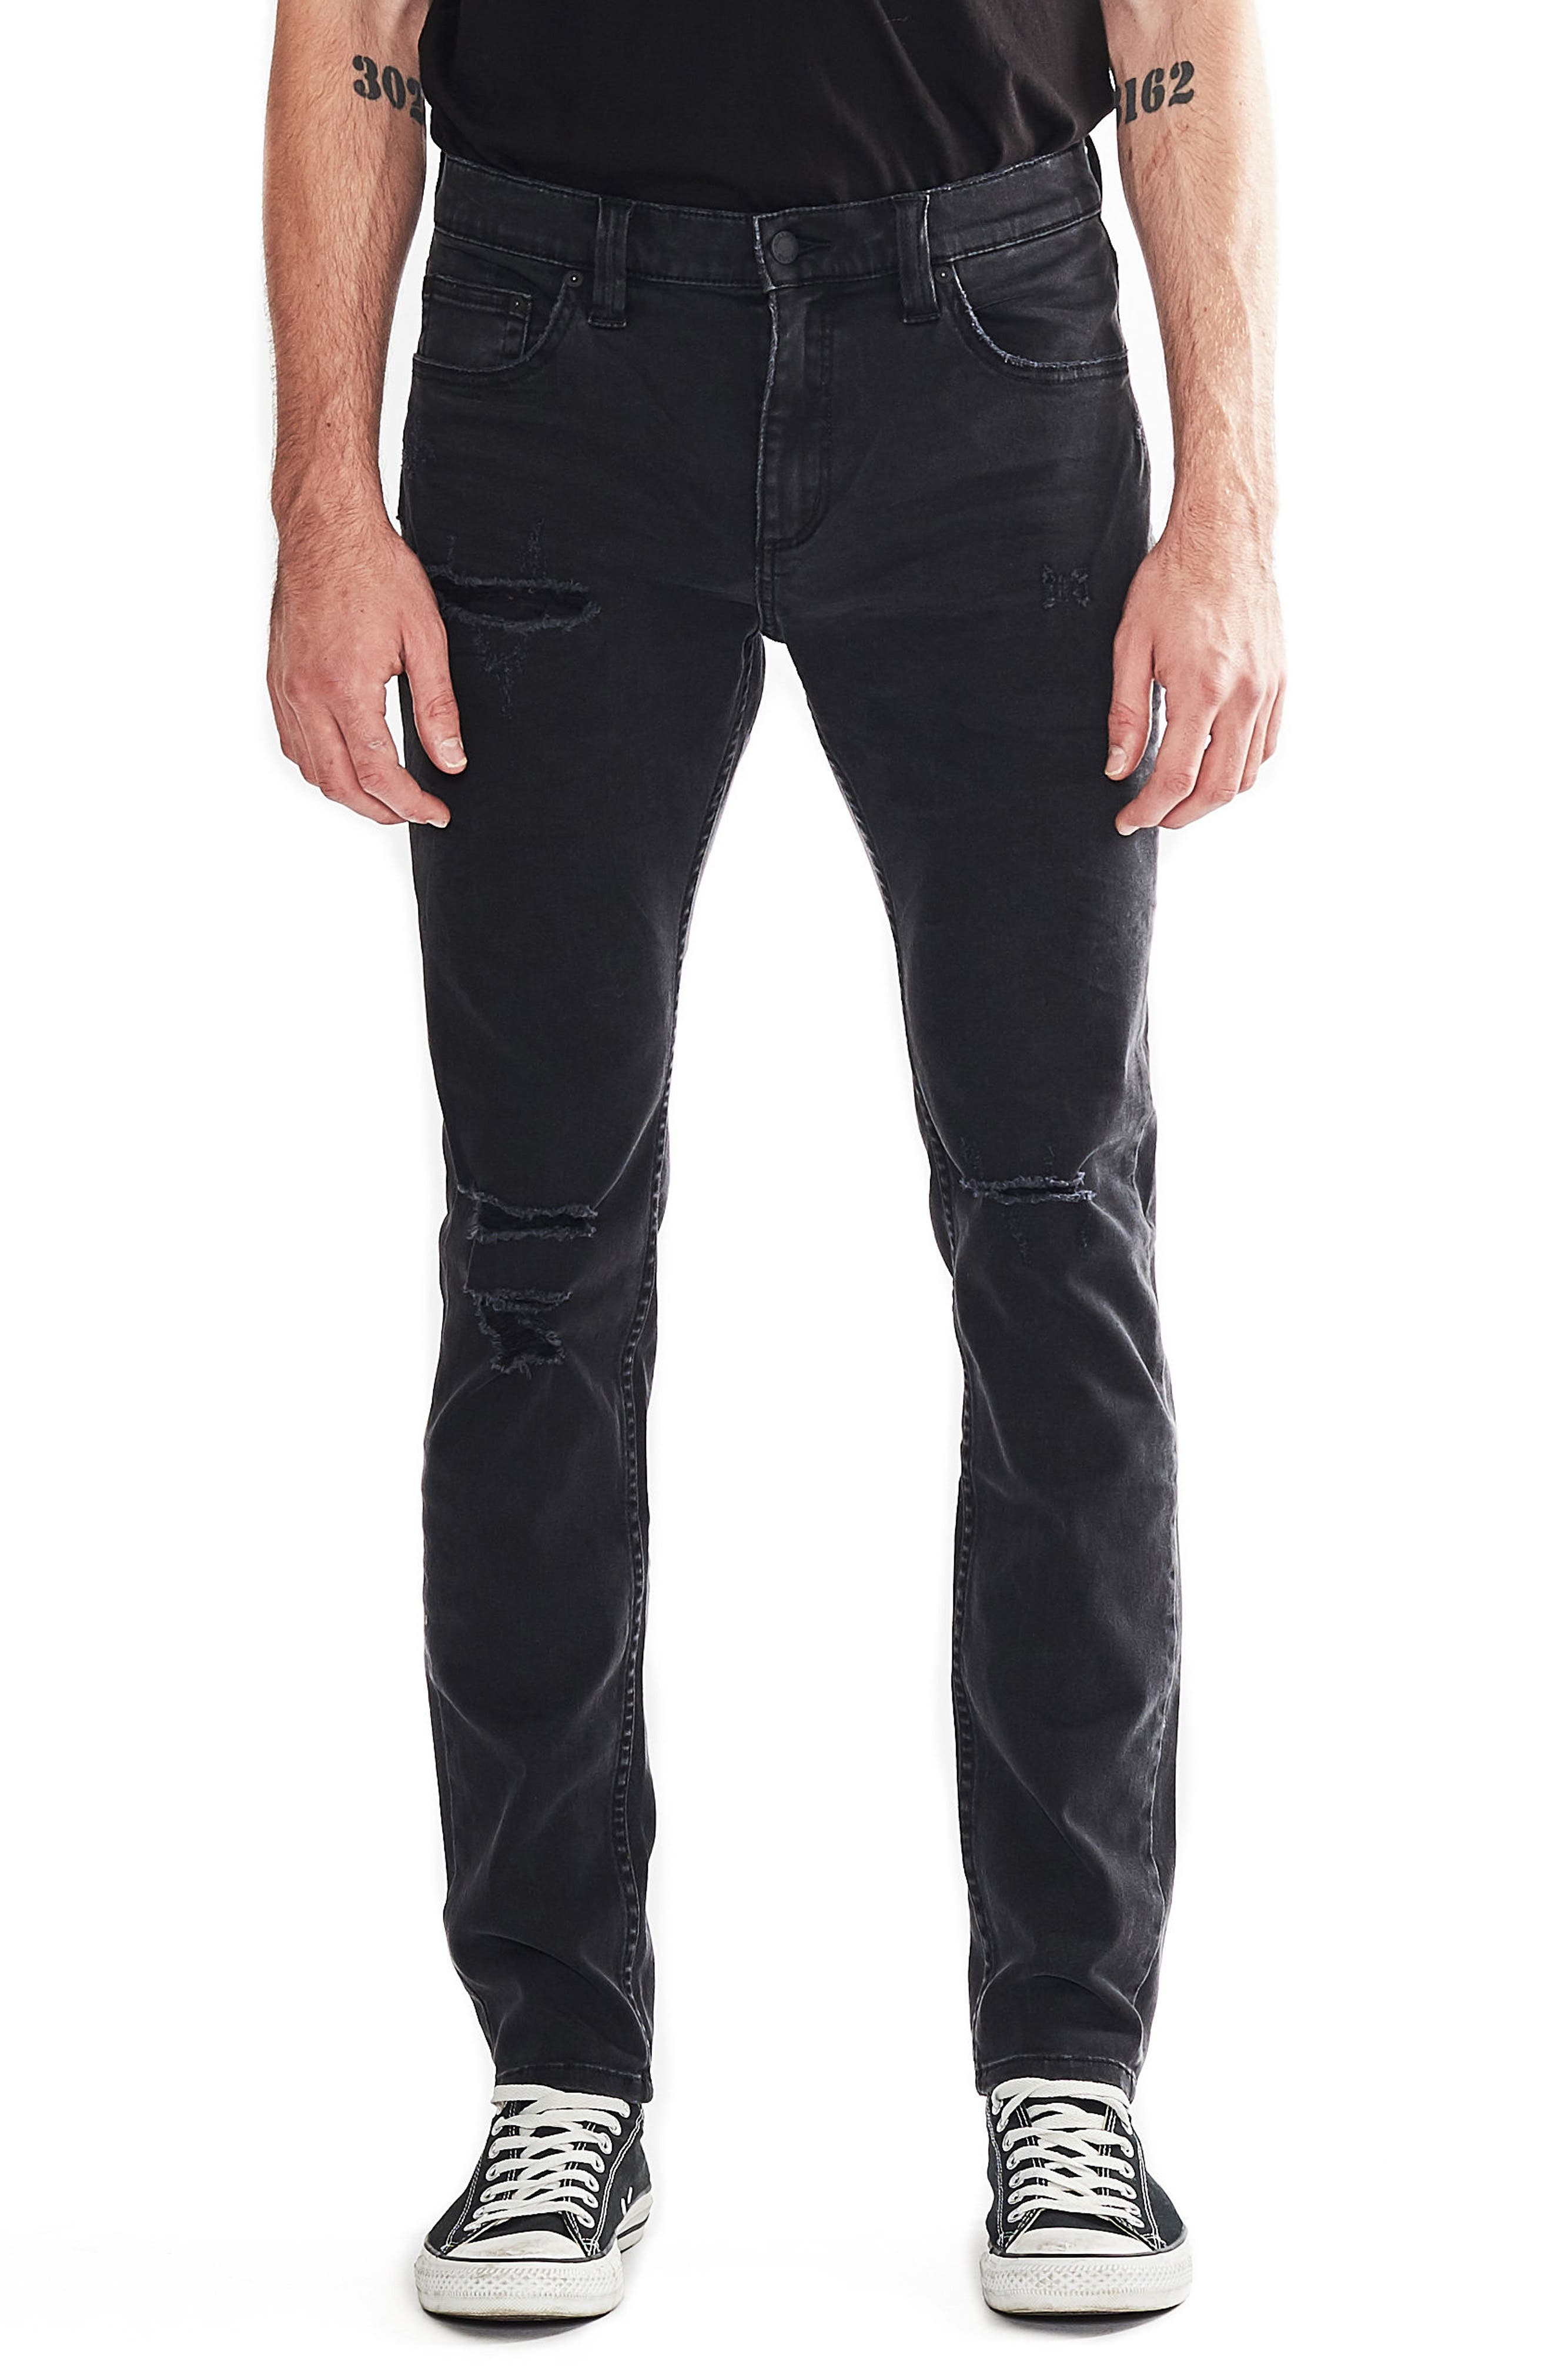 Stinger Skinny Fit Jeans,                             Main thumbnail 1, color,                             BLOWOUT BLACK